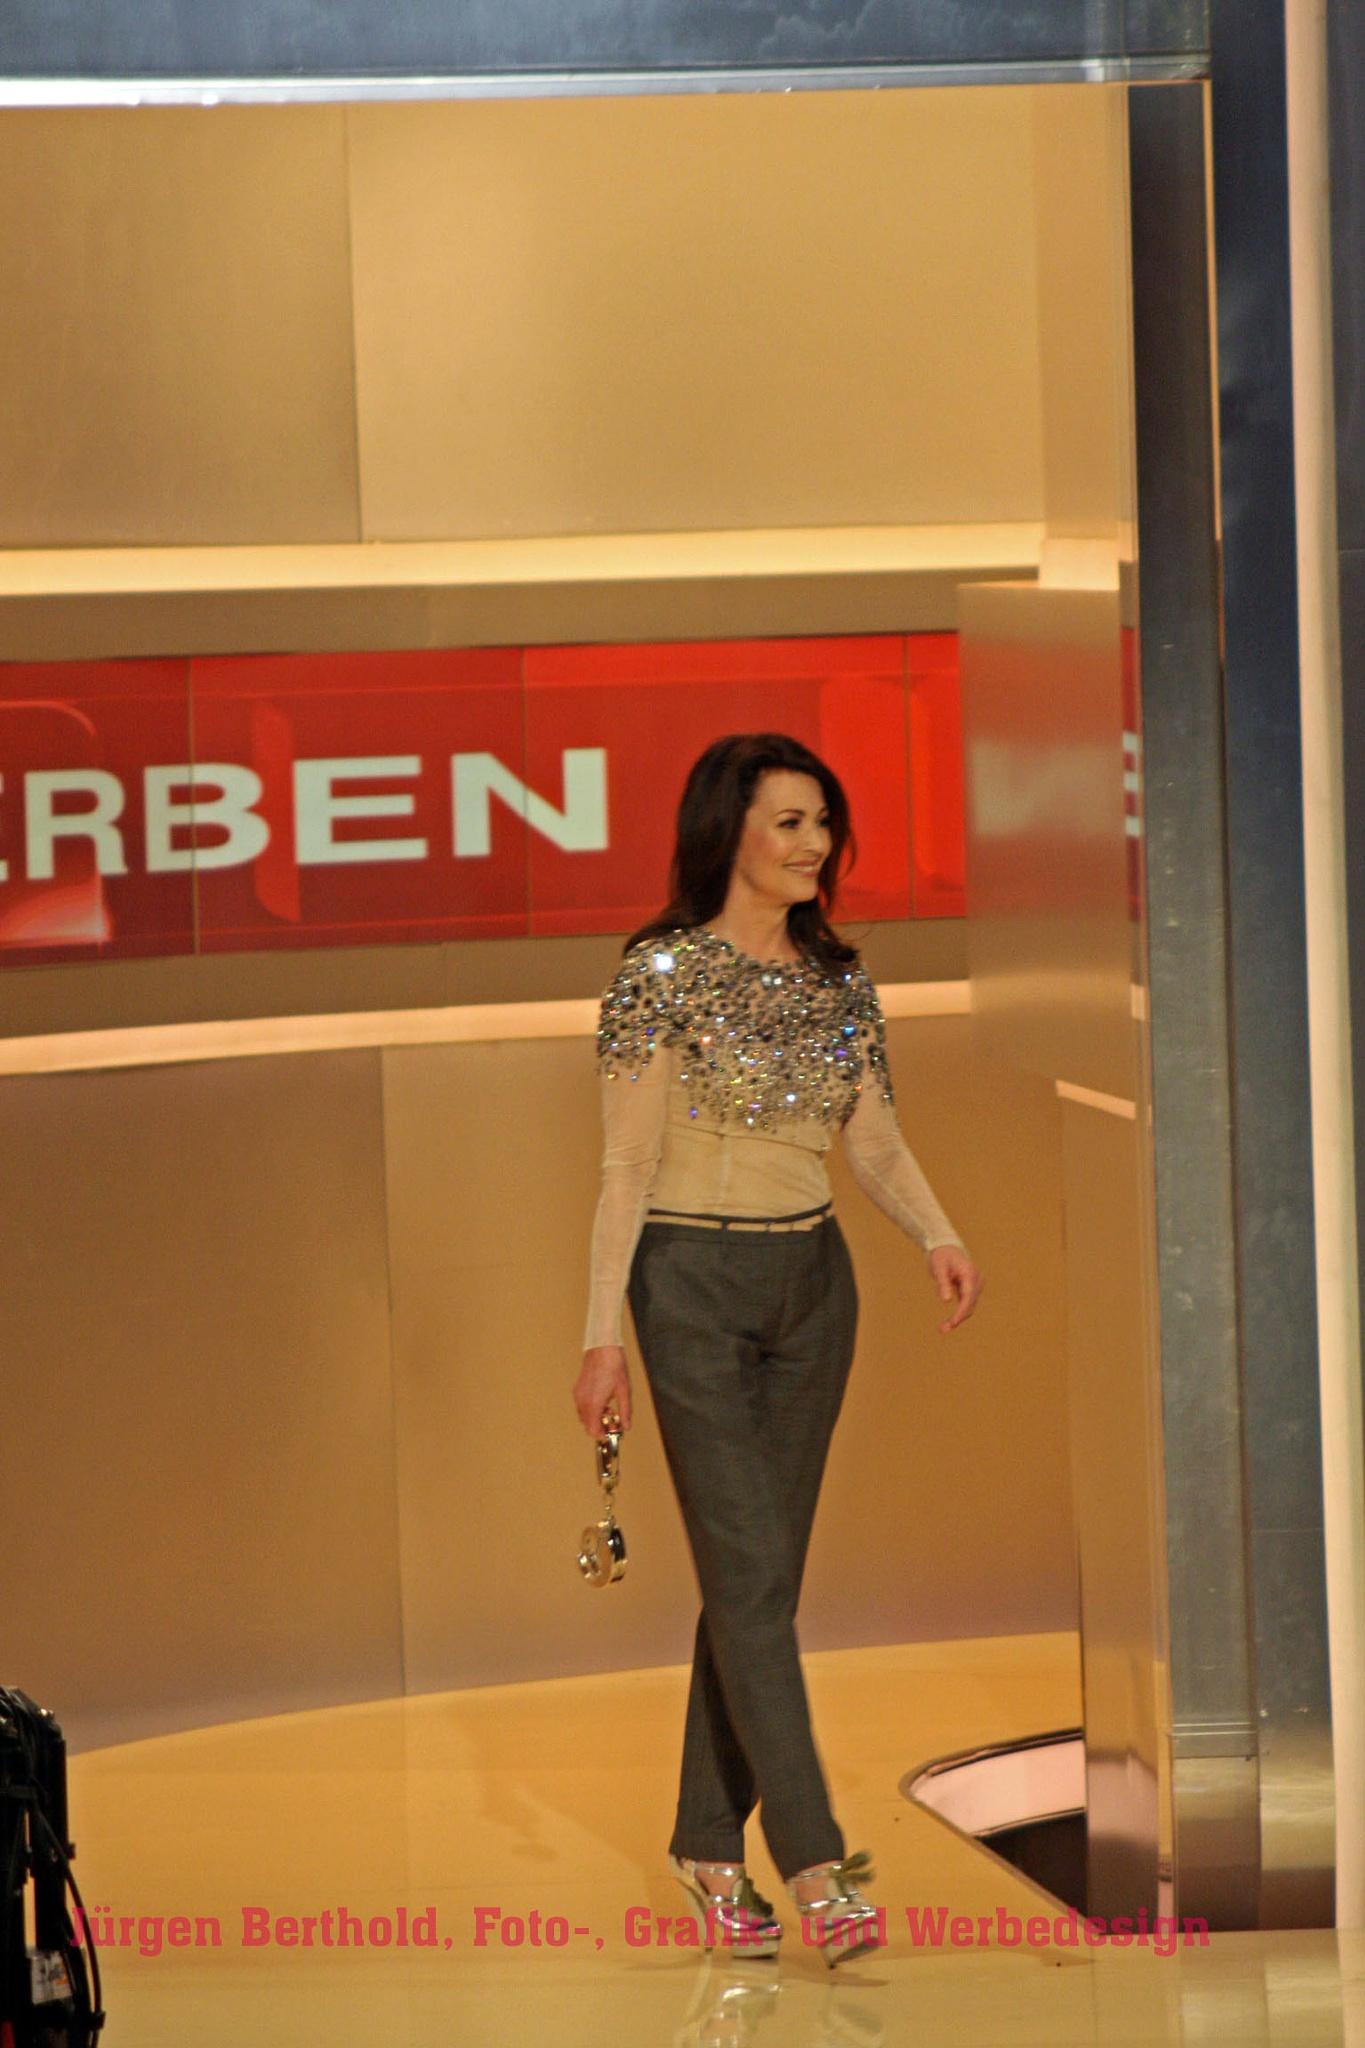 Iris Berben by Steelblue67